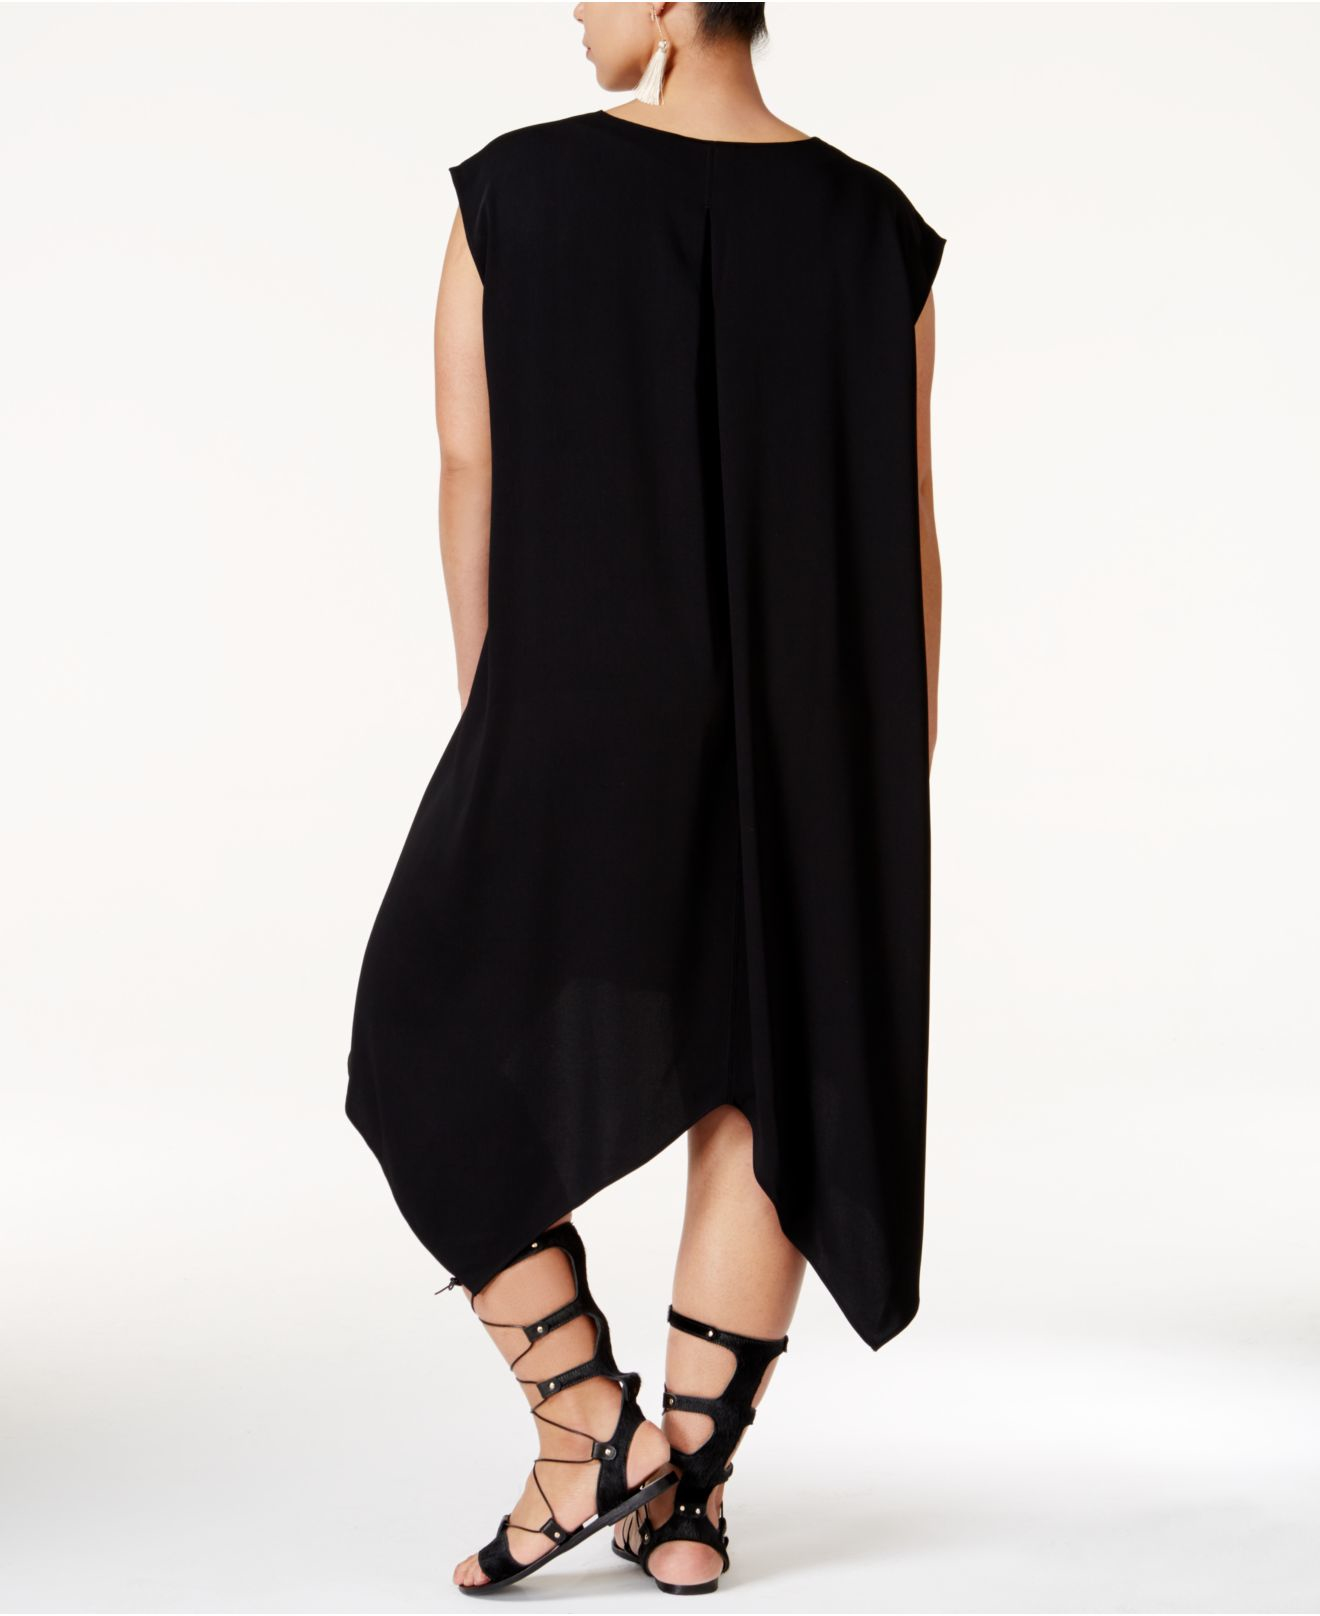 da4b8c55f26fe Lyst - RACHEL Rachel Roy Plus Size Sydney Sleeveless Handkerchief ...